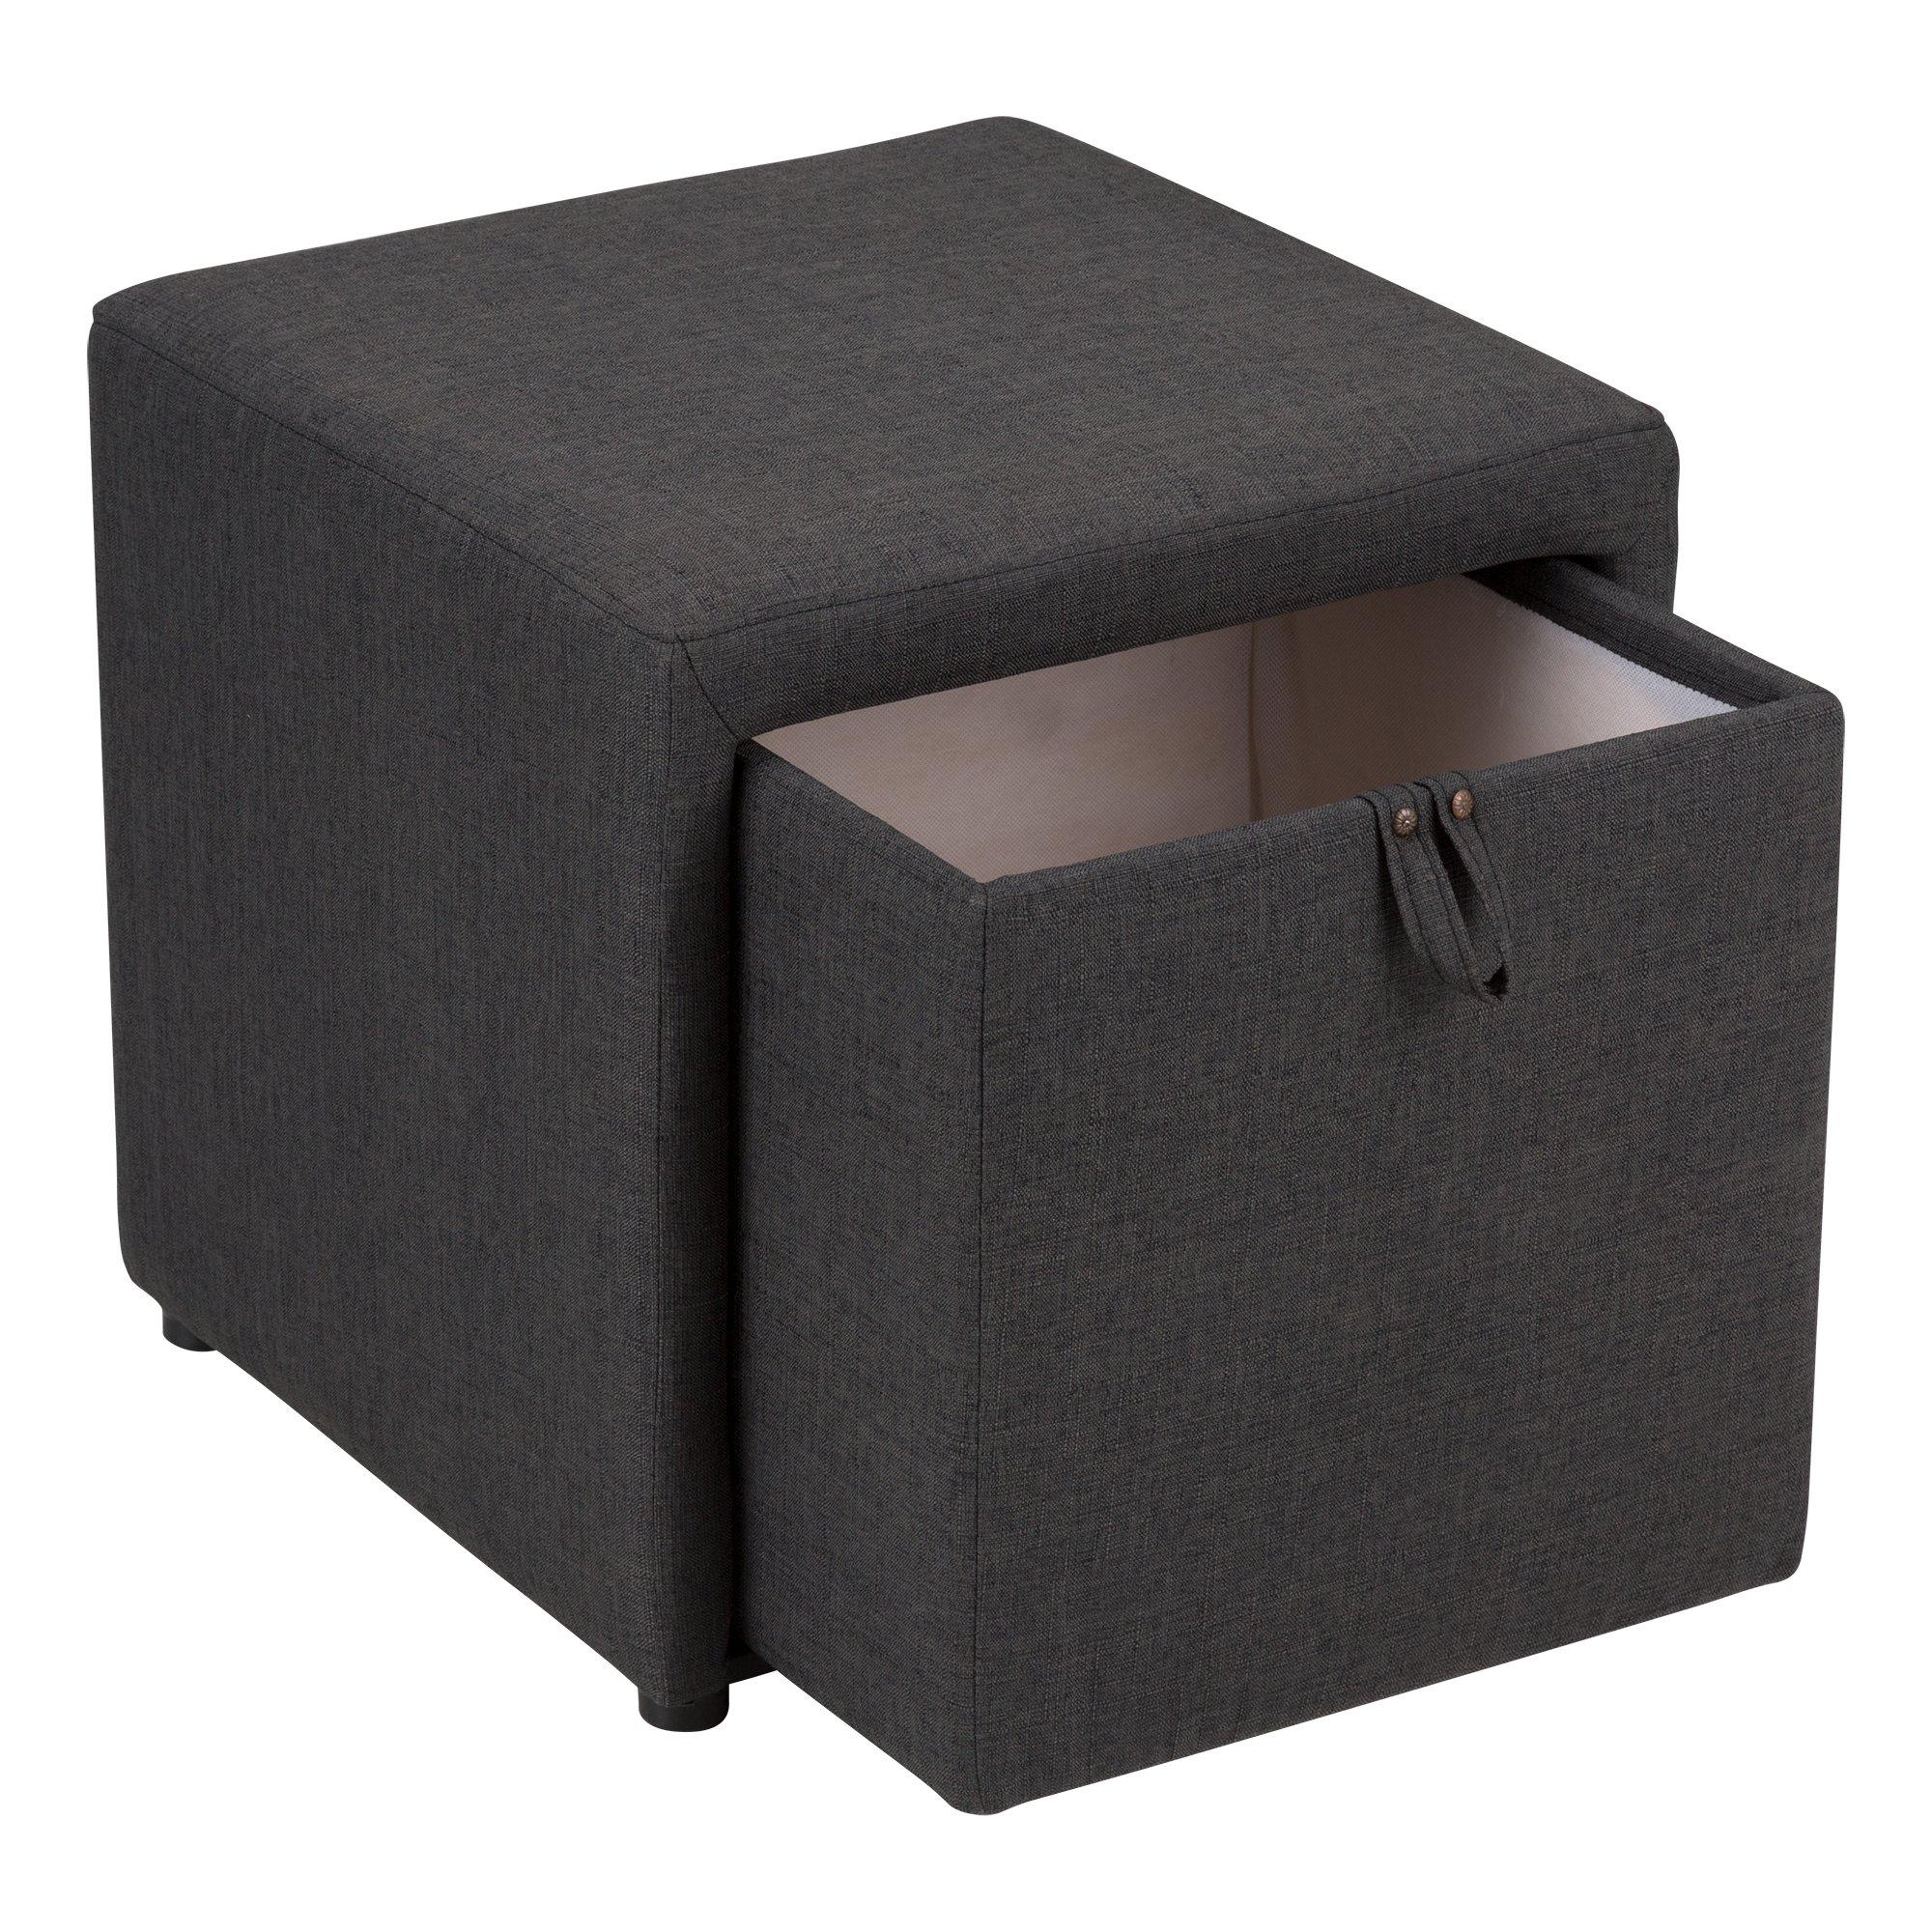 Fat Catalog Cube Storage Stool w/Drawer, Gray, ALT-OUG1001-SO by Fat Catalog (Image #5)